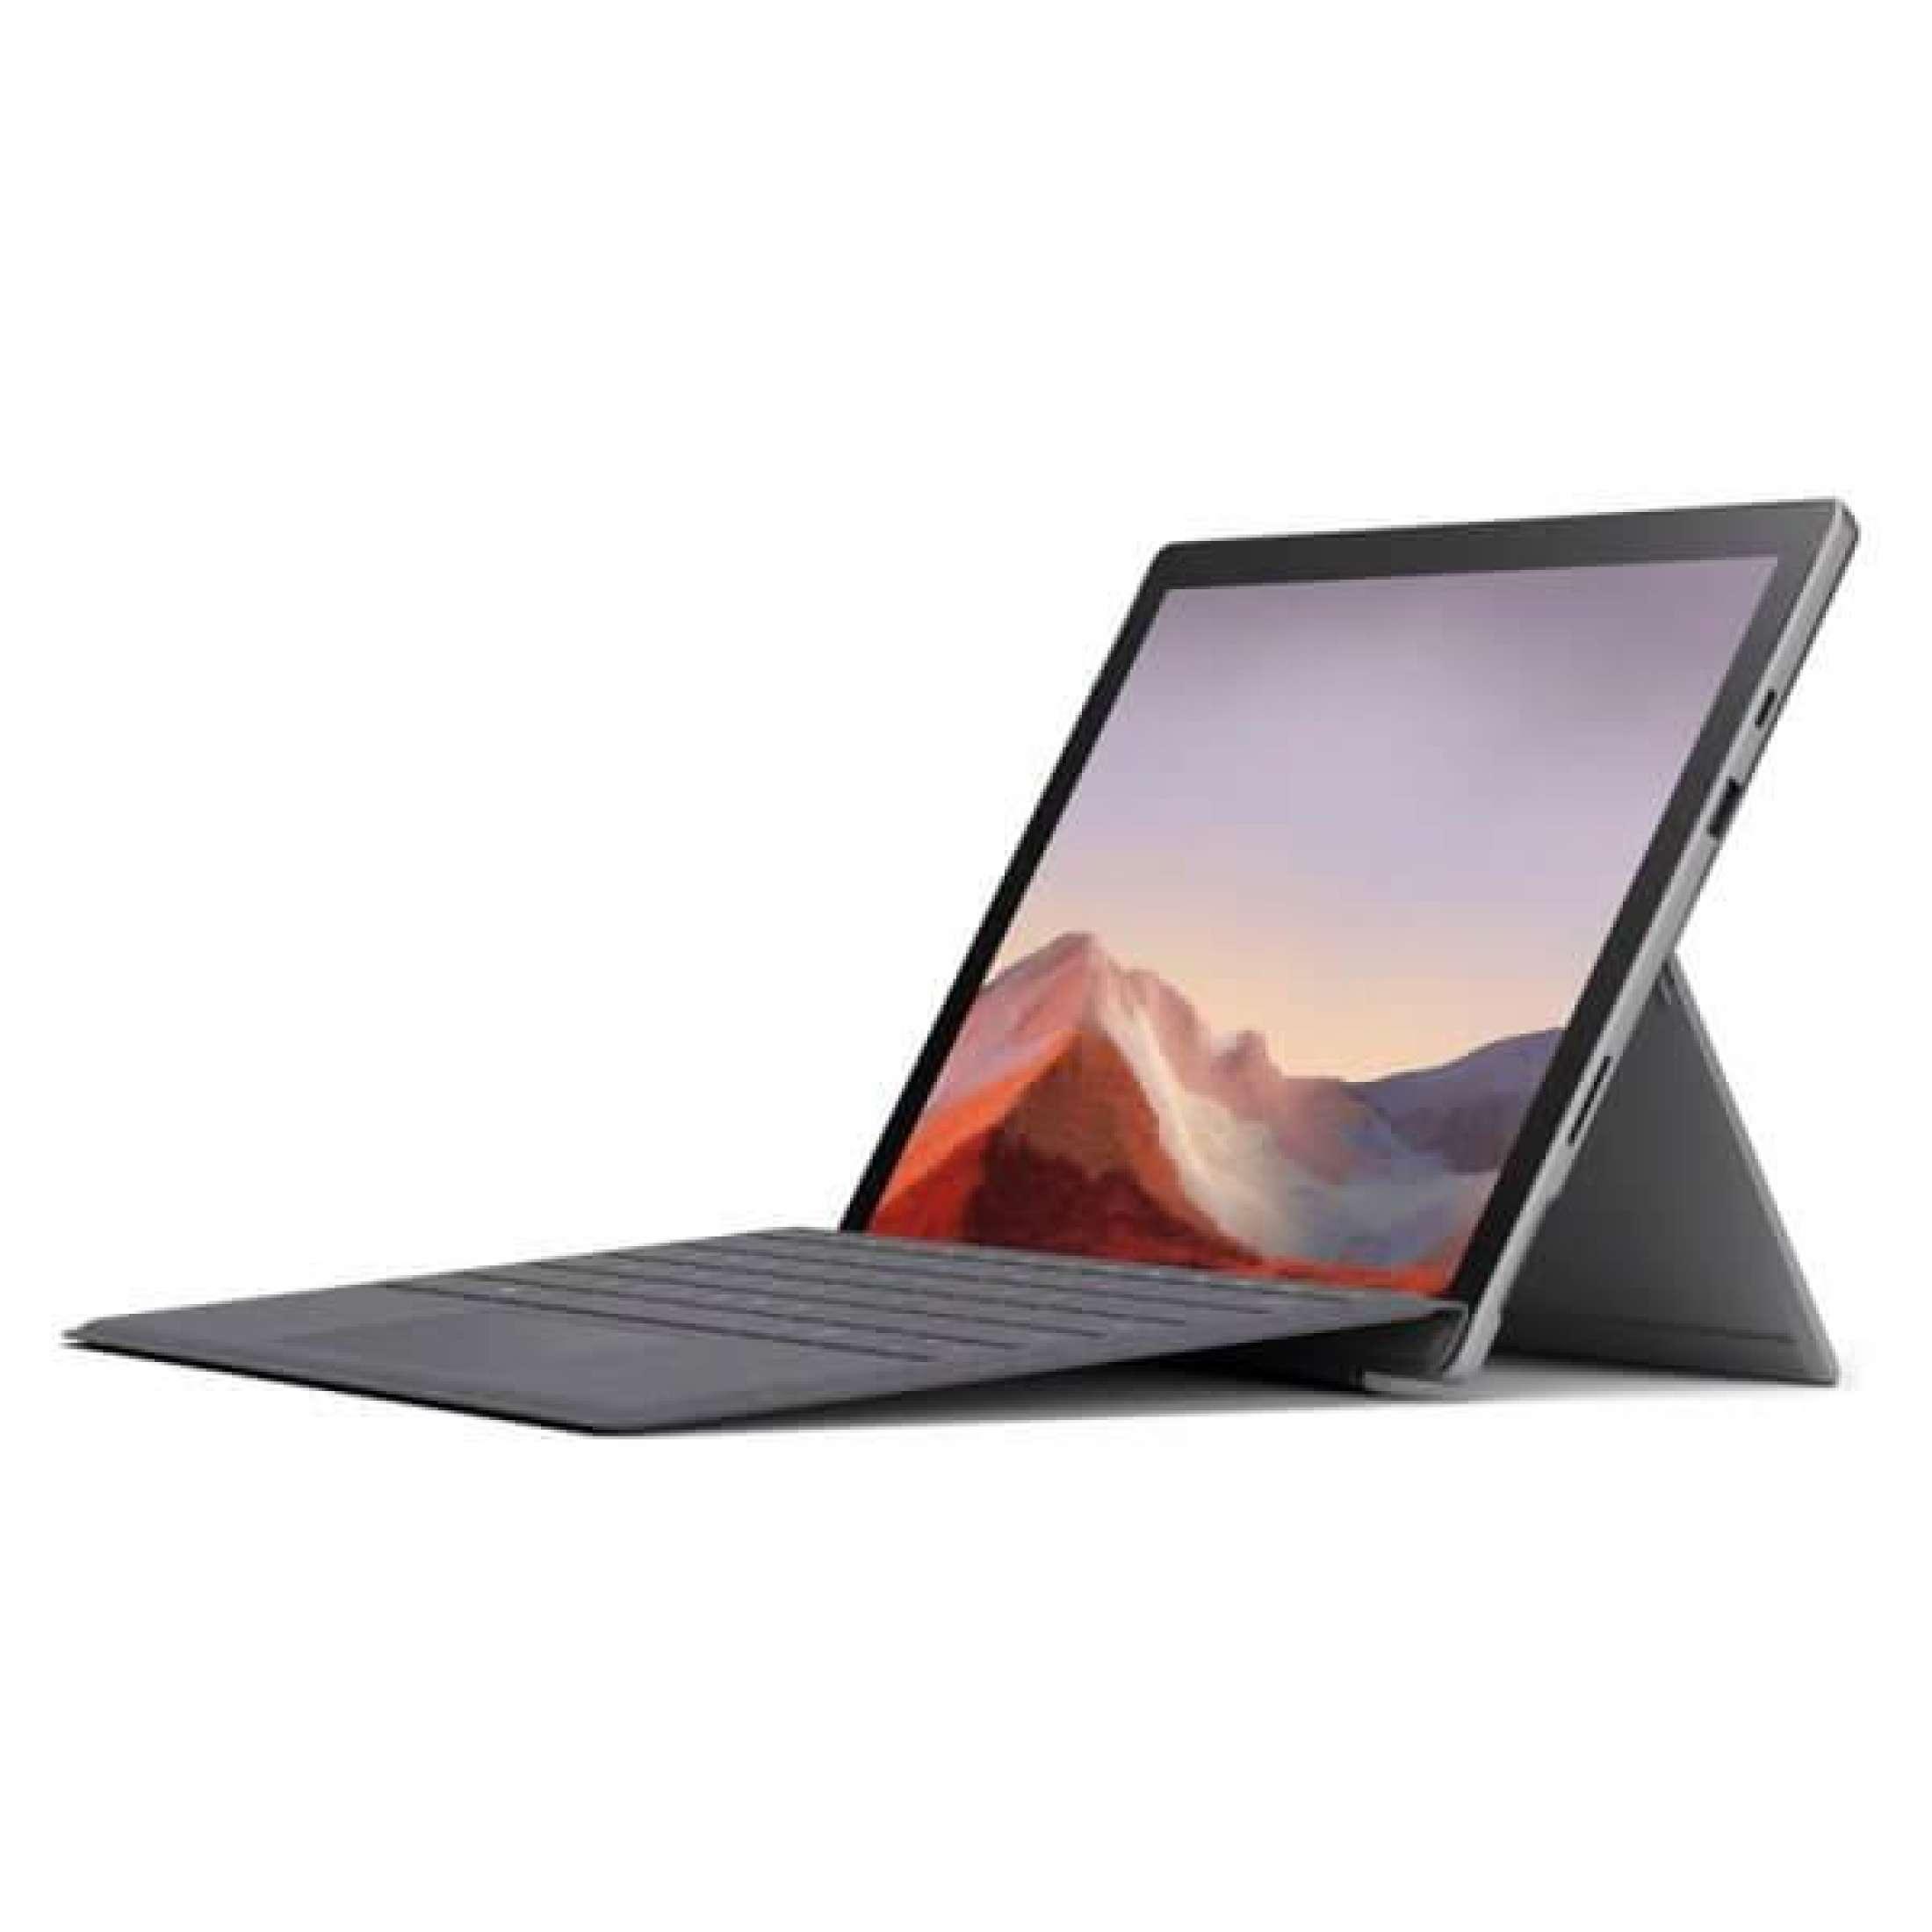 Surface Pro 7 Core I5 Ram 8Gb Ssd 256Gb Brand New - Nhập Khẩu